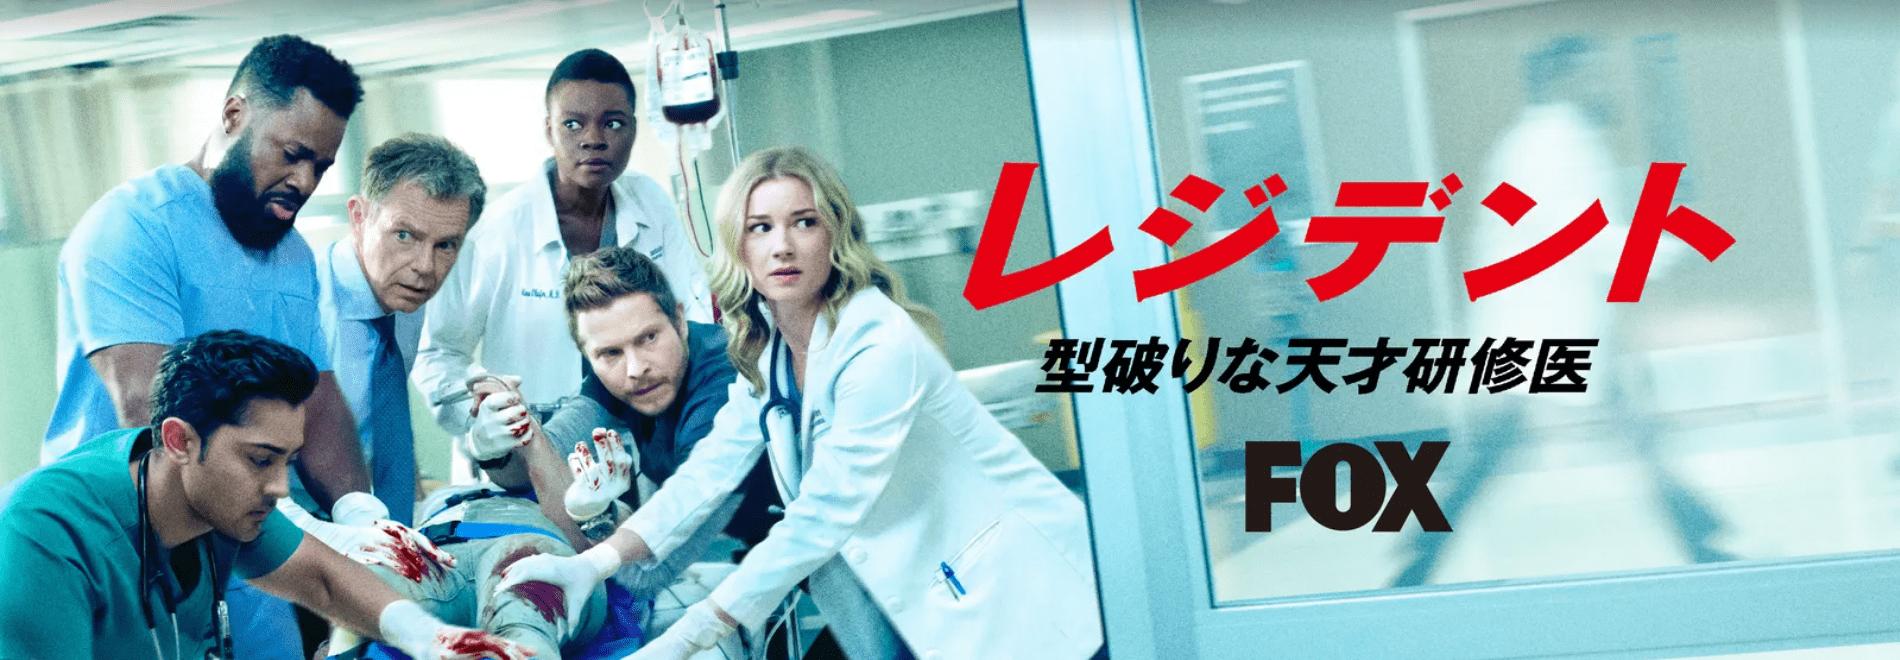 【Huluおすすめ海外ドラマ】Hulu(フールー)のおすすめ海外ドラマ作品一覧|ウォーキングデッド・ゲームオブスローンズ・Huluプレミア作品など充実!|FOXチャンネル編:【水曜22時】レジデント 型破りな天才研修医 シーズン3